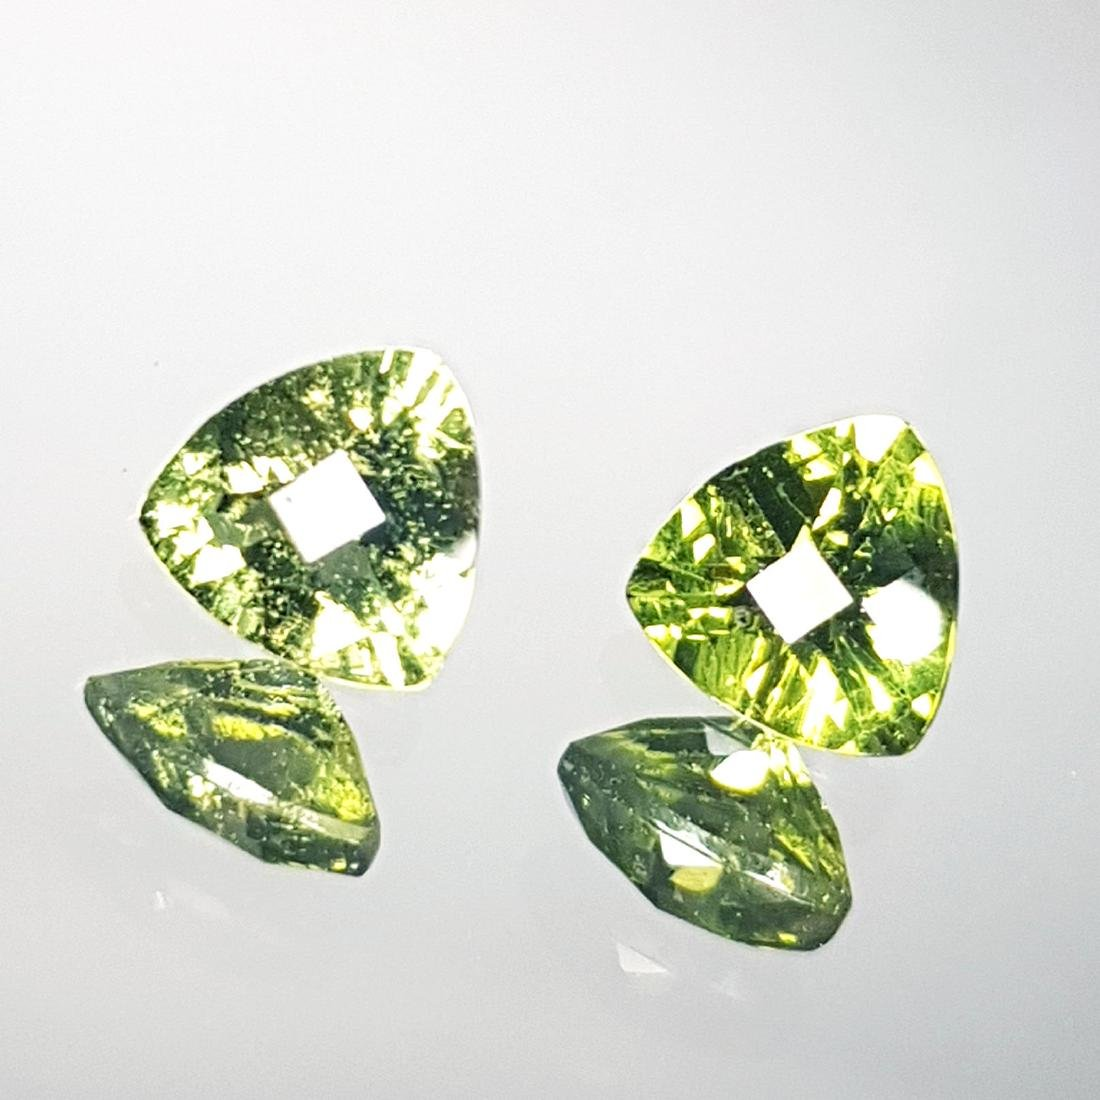 2 Pcs of Natural Moldavite - 1.14 ct - 2